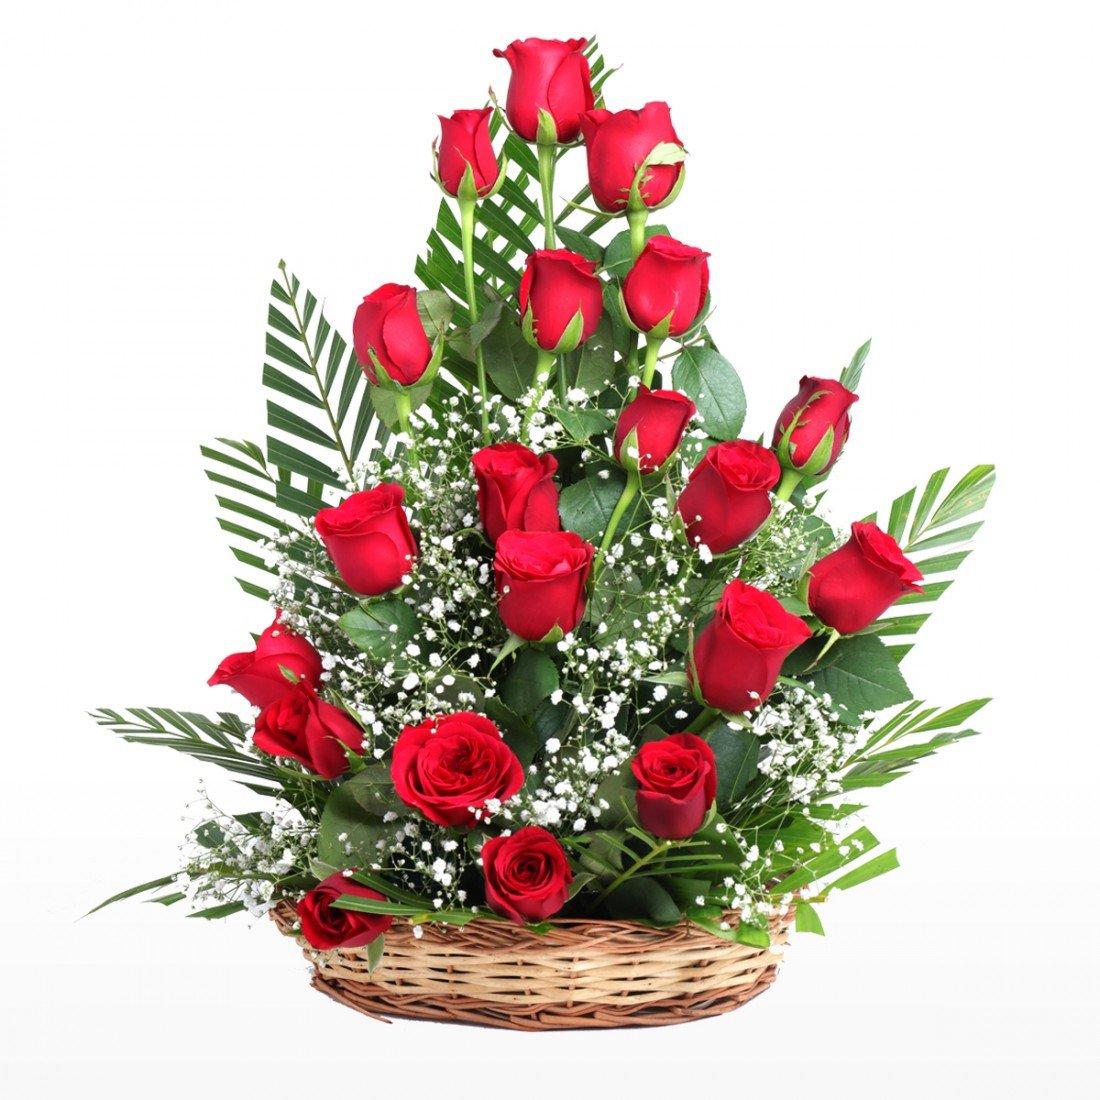 20 Red Roses In Basket